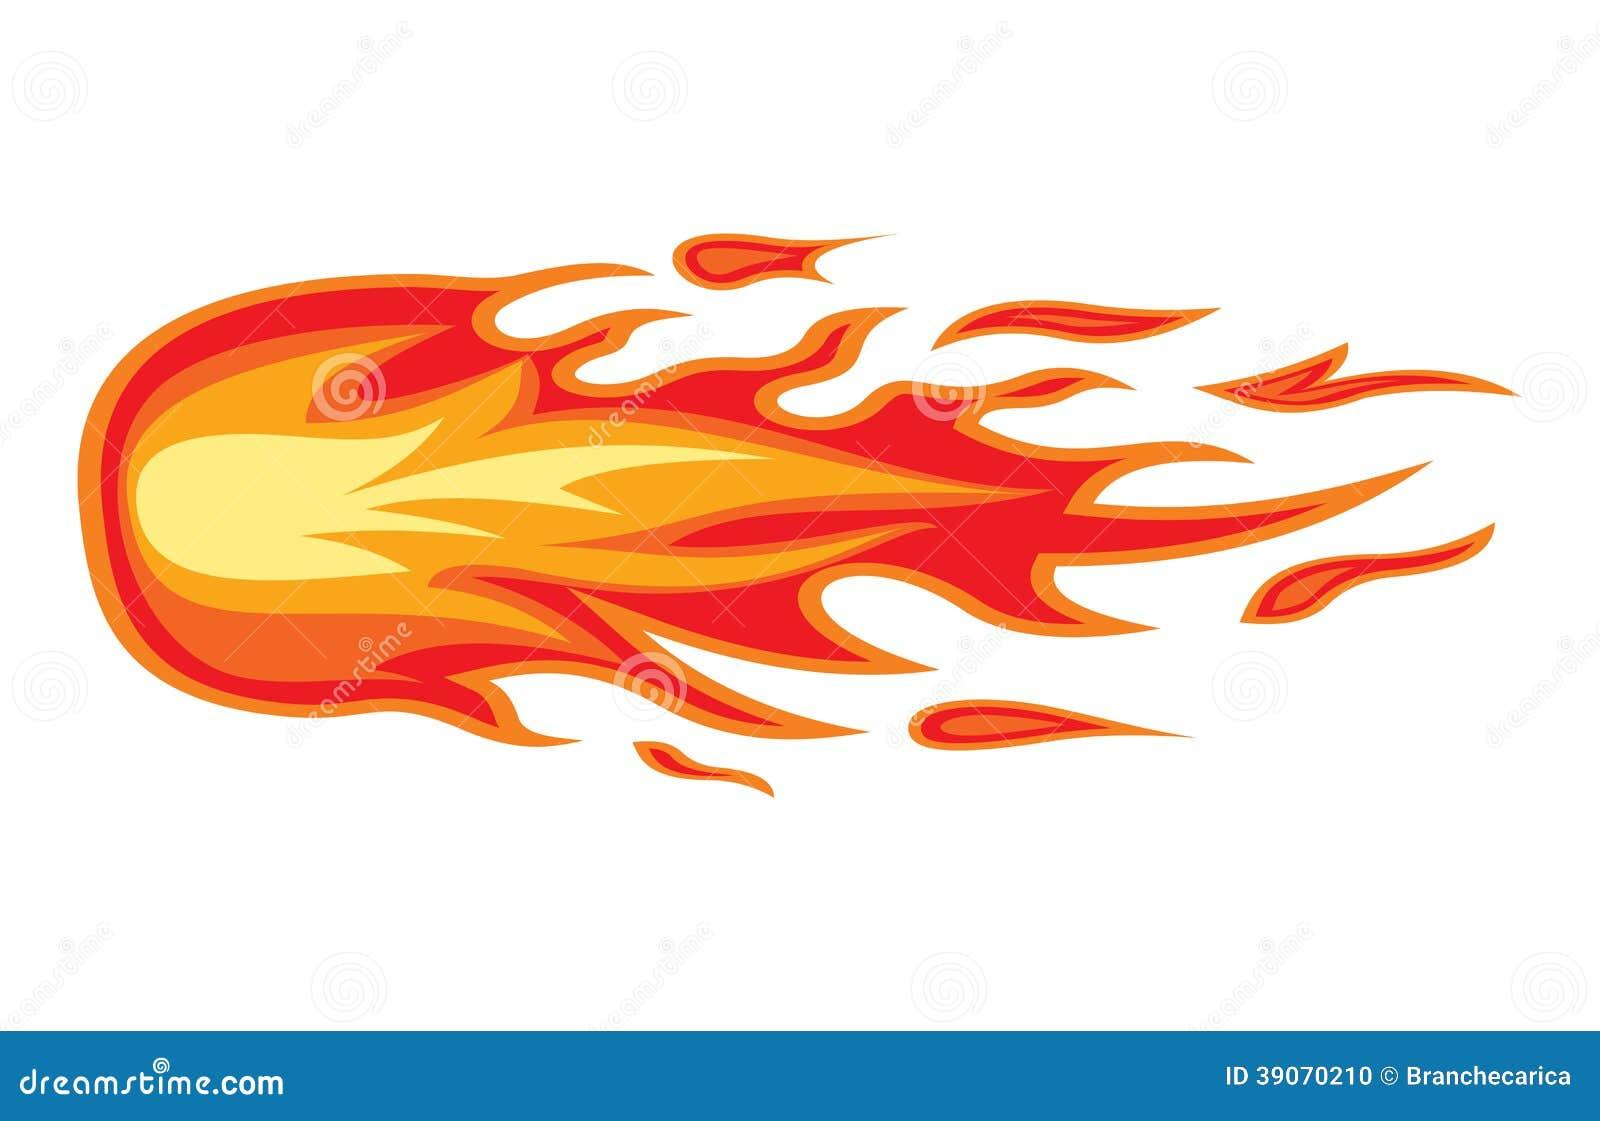 Free Fire Graphics: Fire Flame Stock Illustration. Illustration Of Bonfire